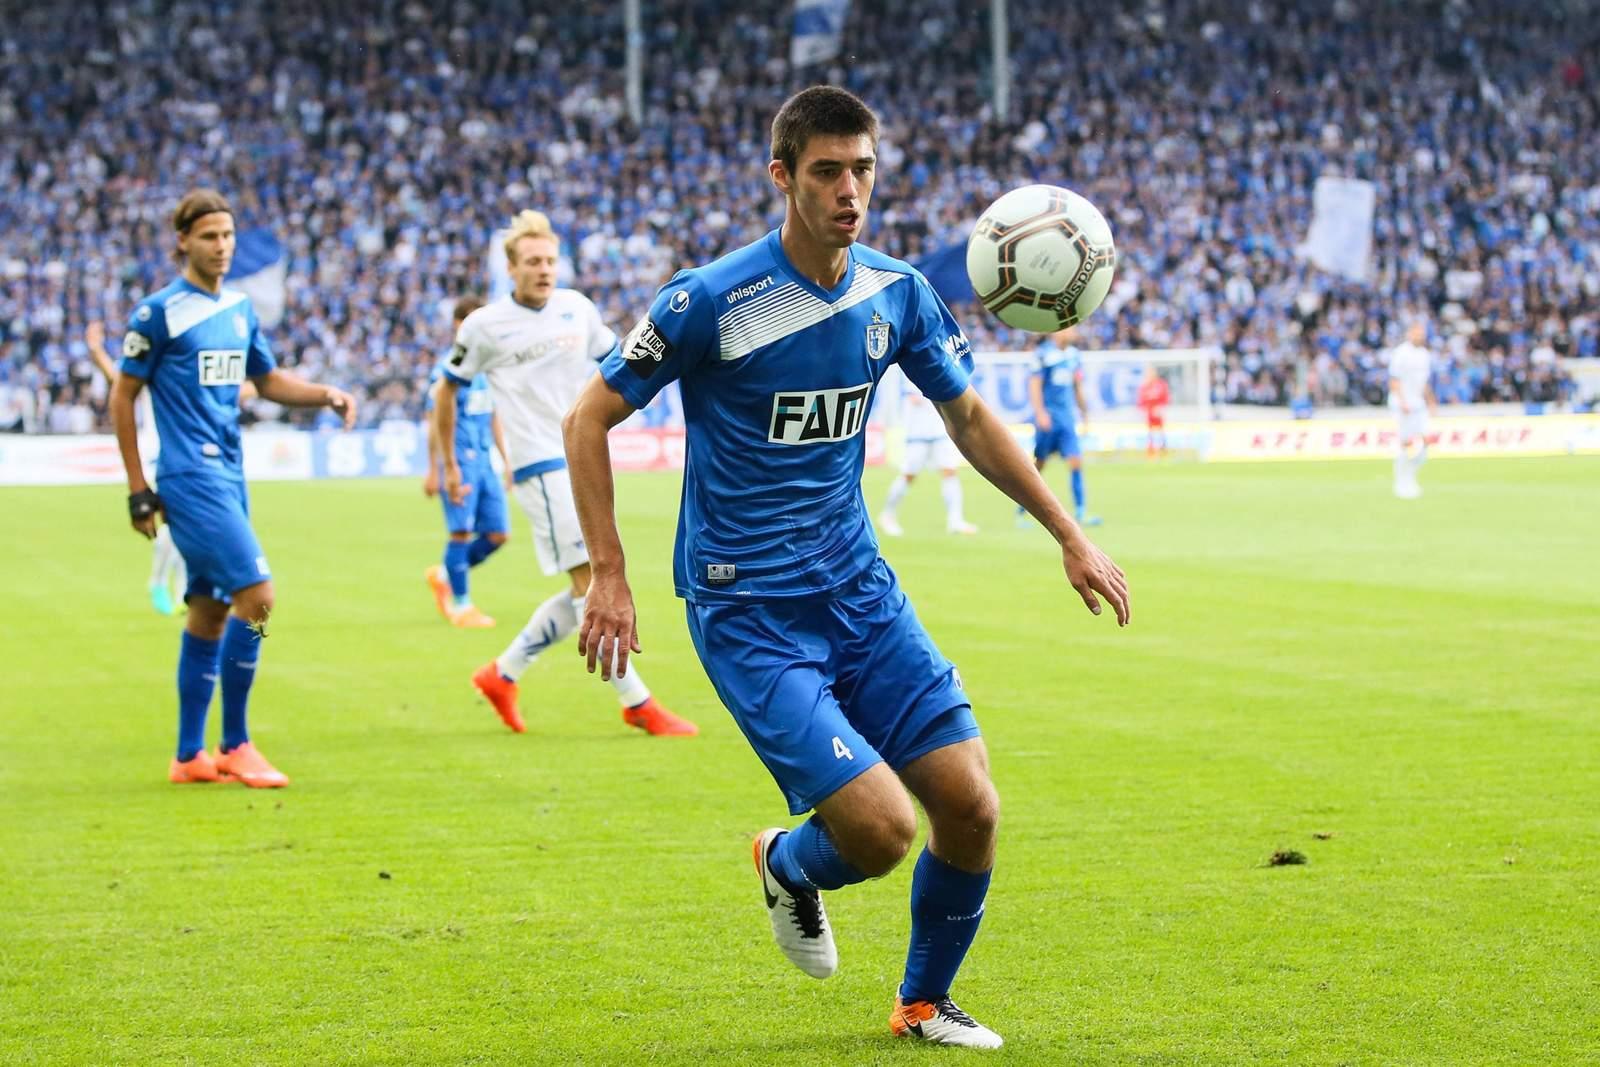 Moritz Sprenger vom 1. FC Magdeburg